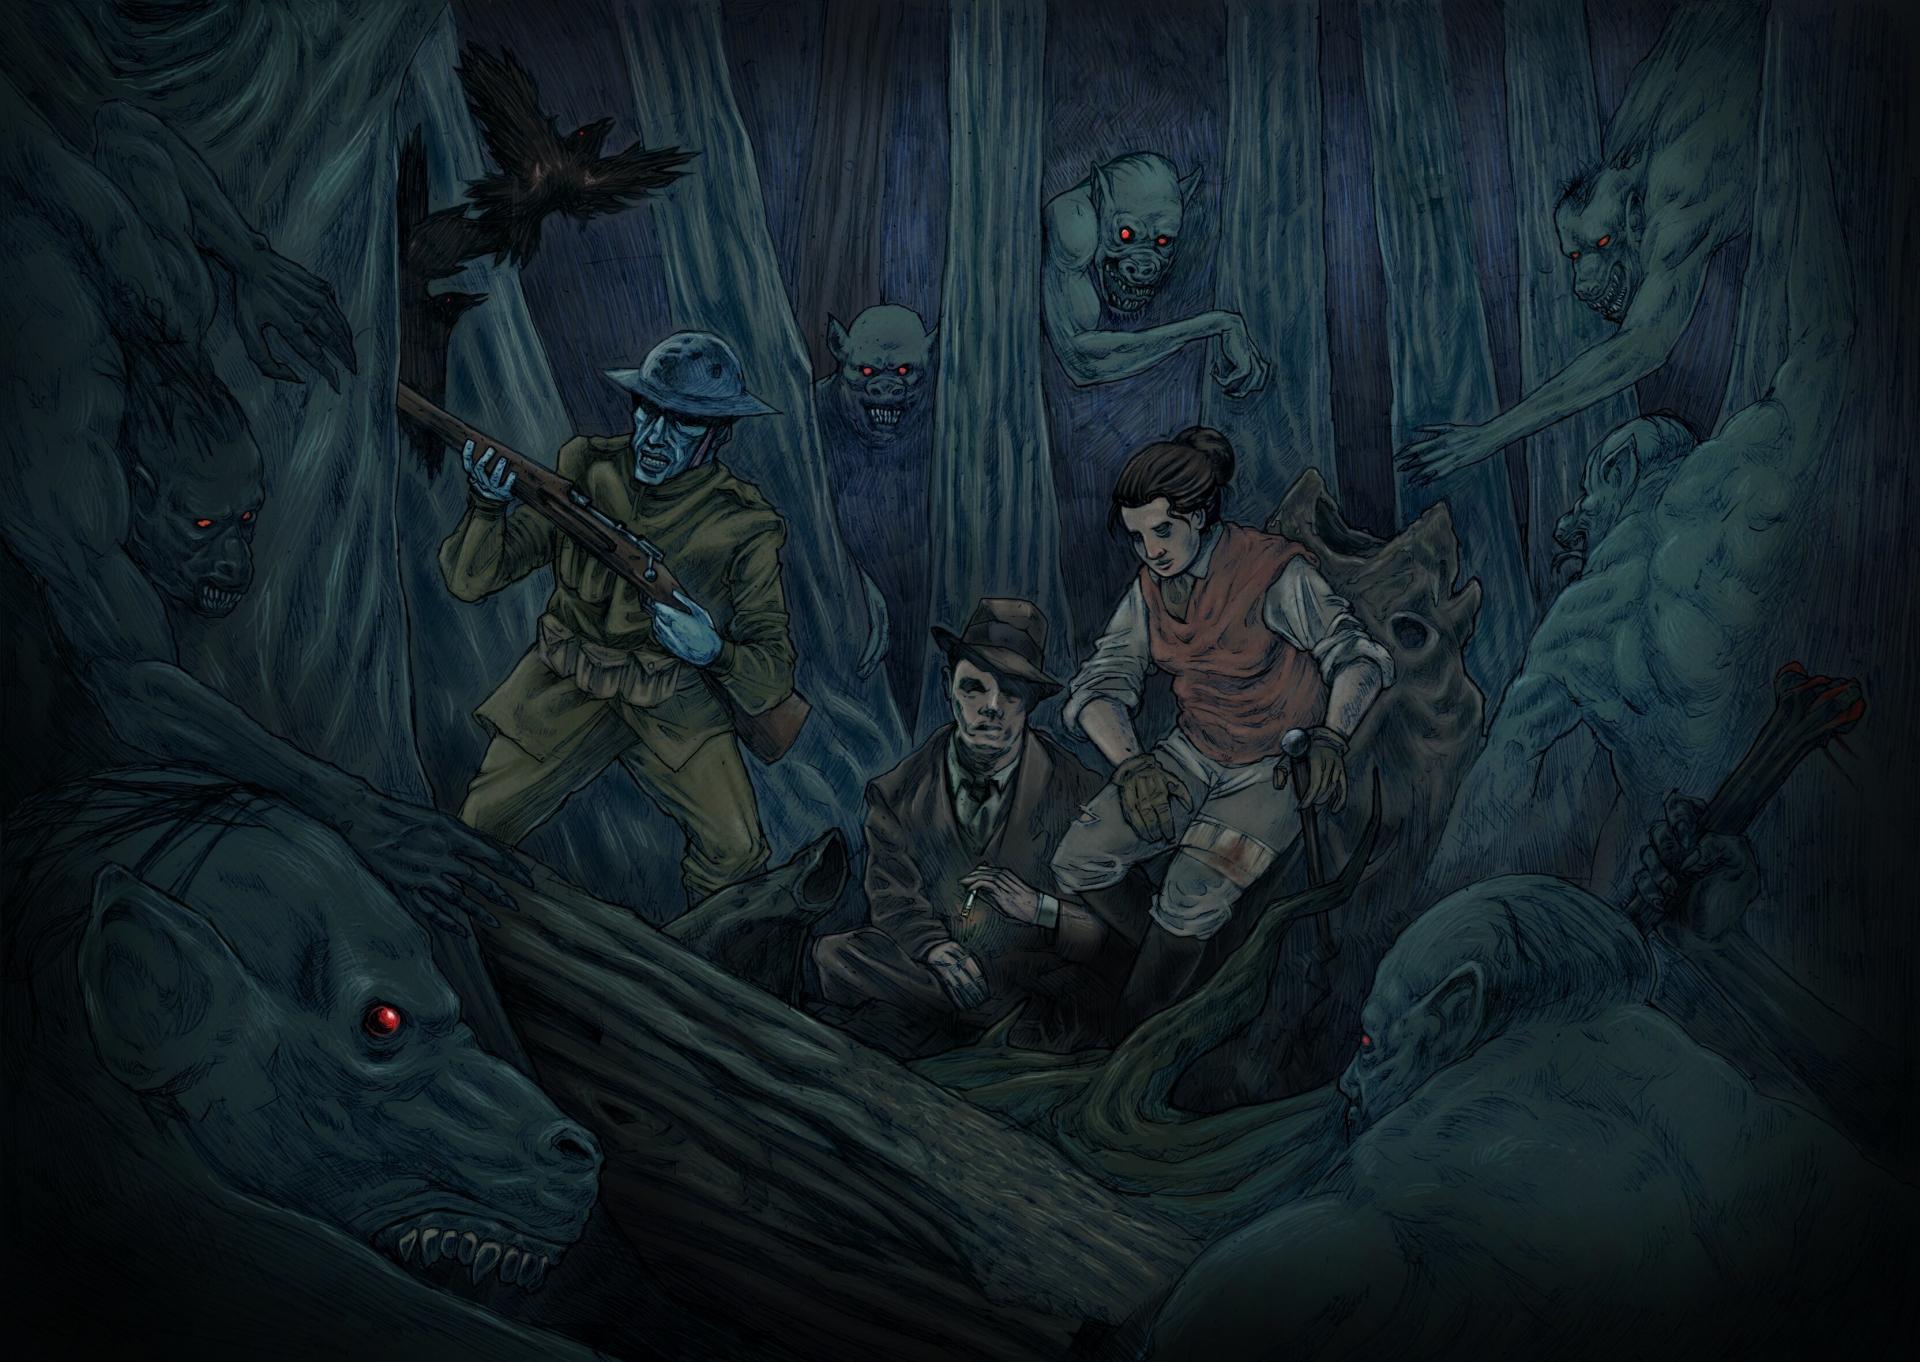 Арт к игре Stygian: Reign of the Old Ones